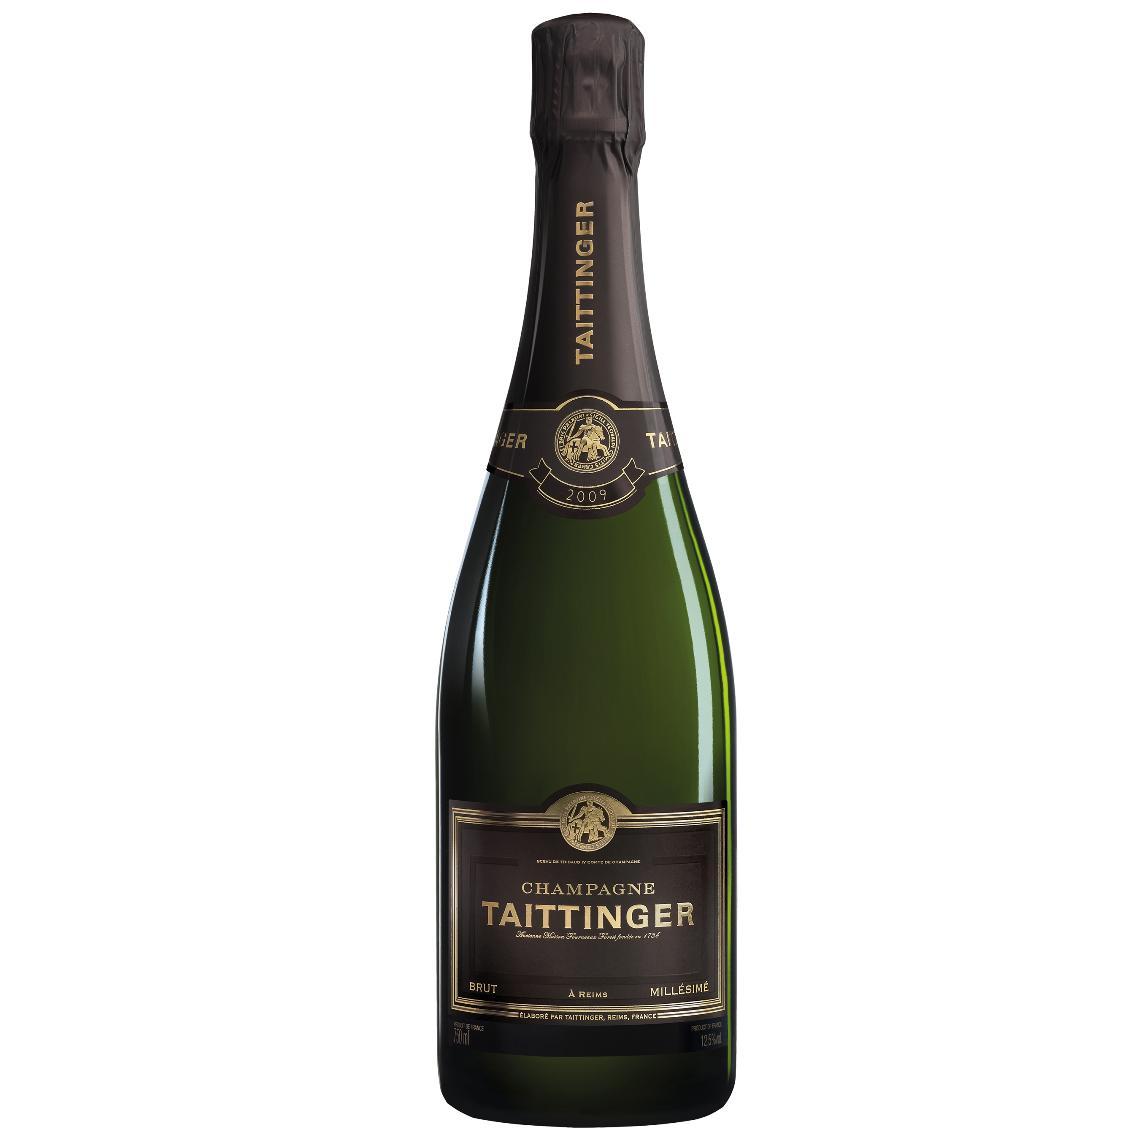 MAGNUM (1,5 l.) 2014 Taittinger Brut - Champagne